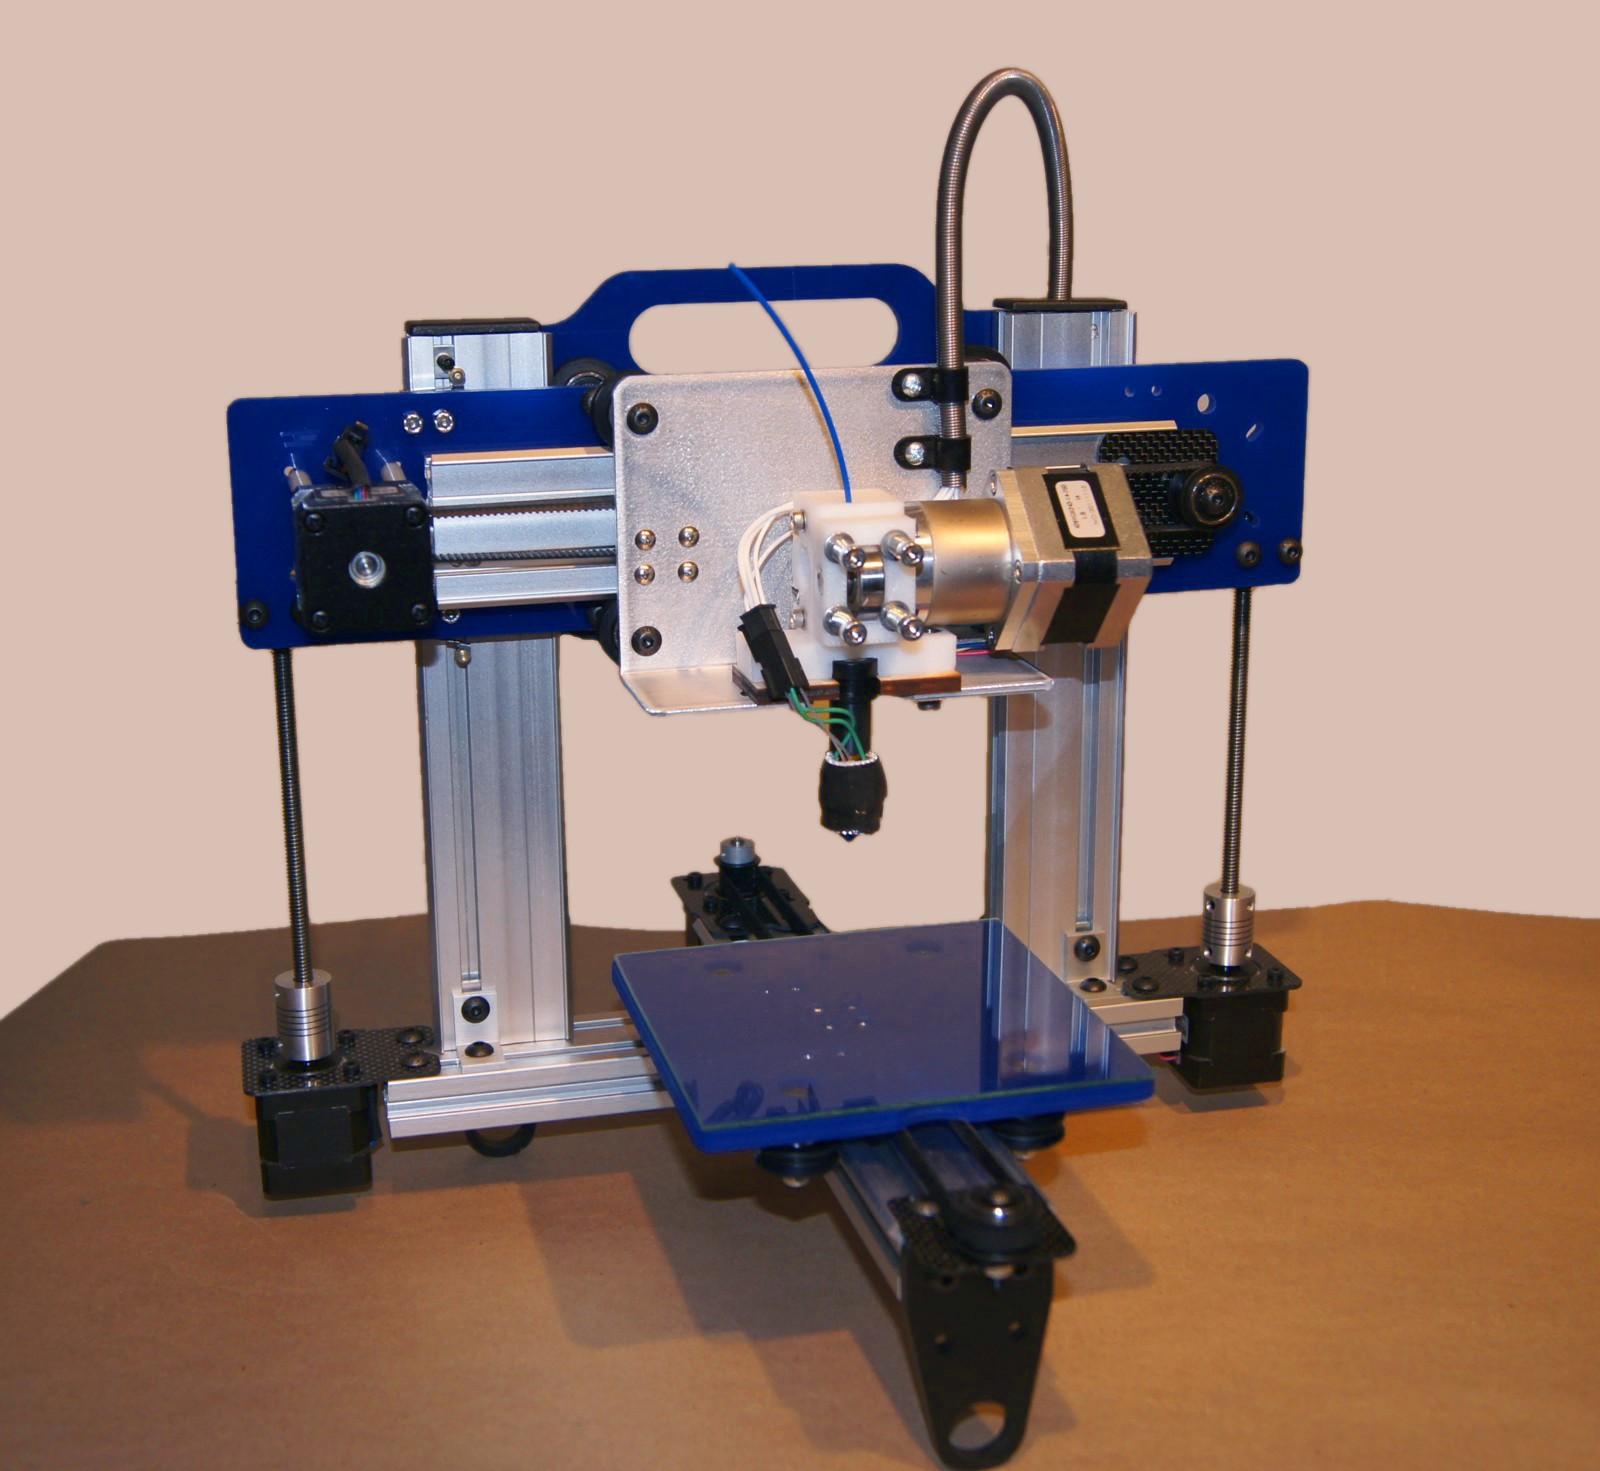 http://en.wikipedia.org/wiki/3D_printing